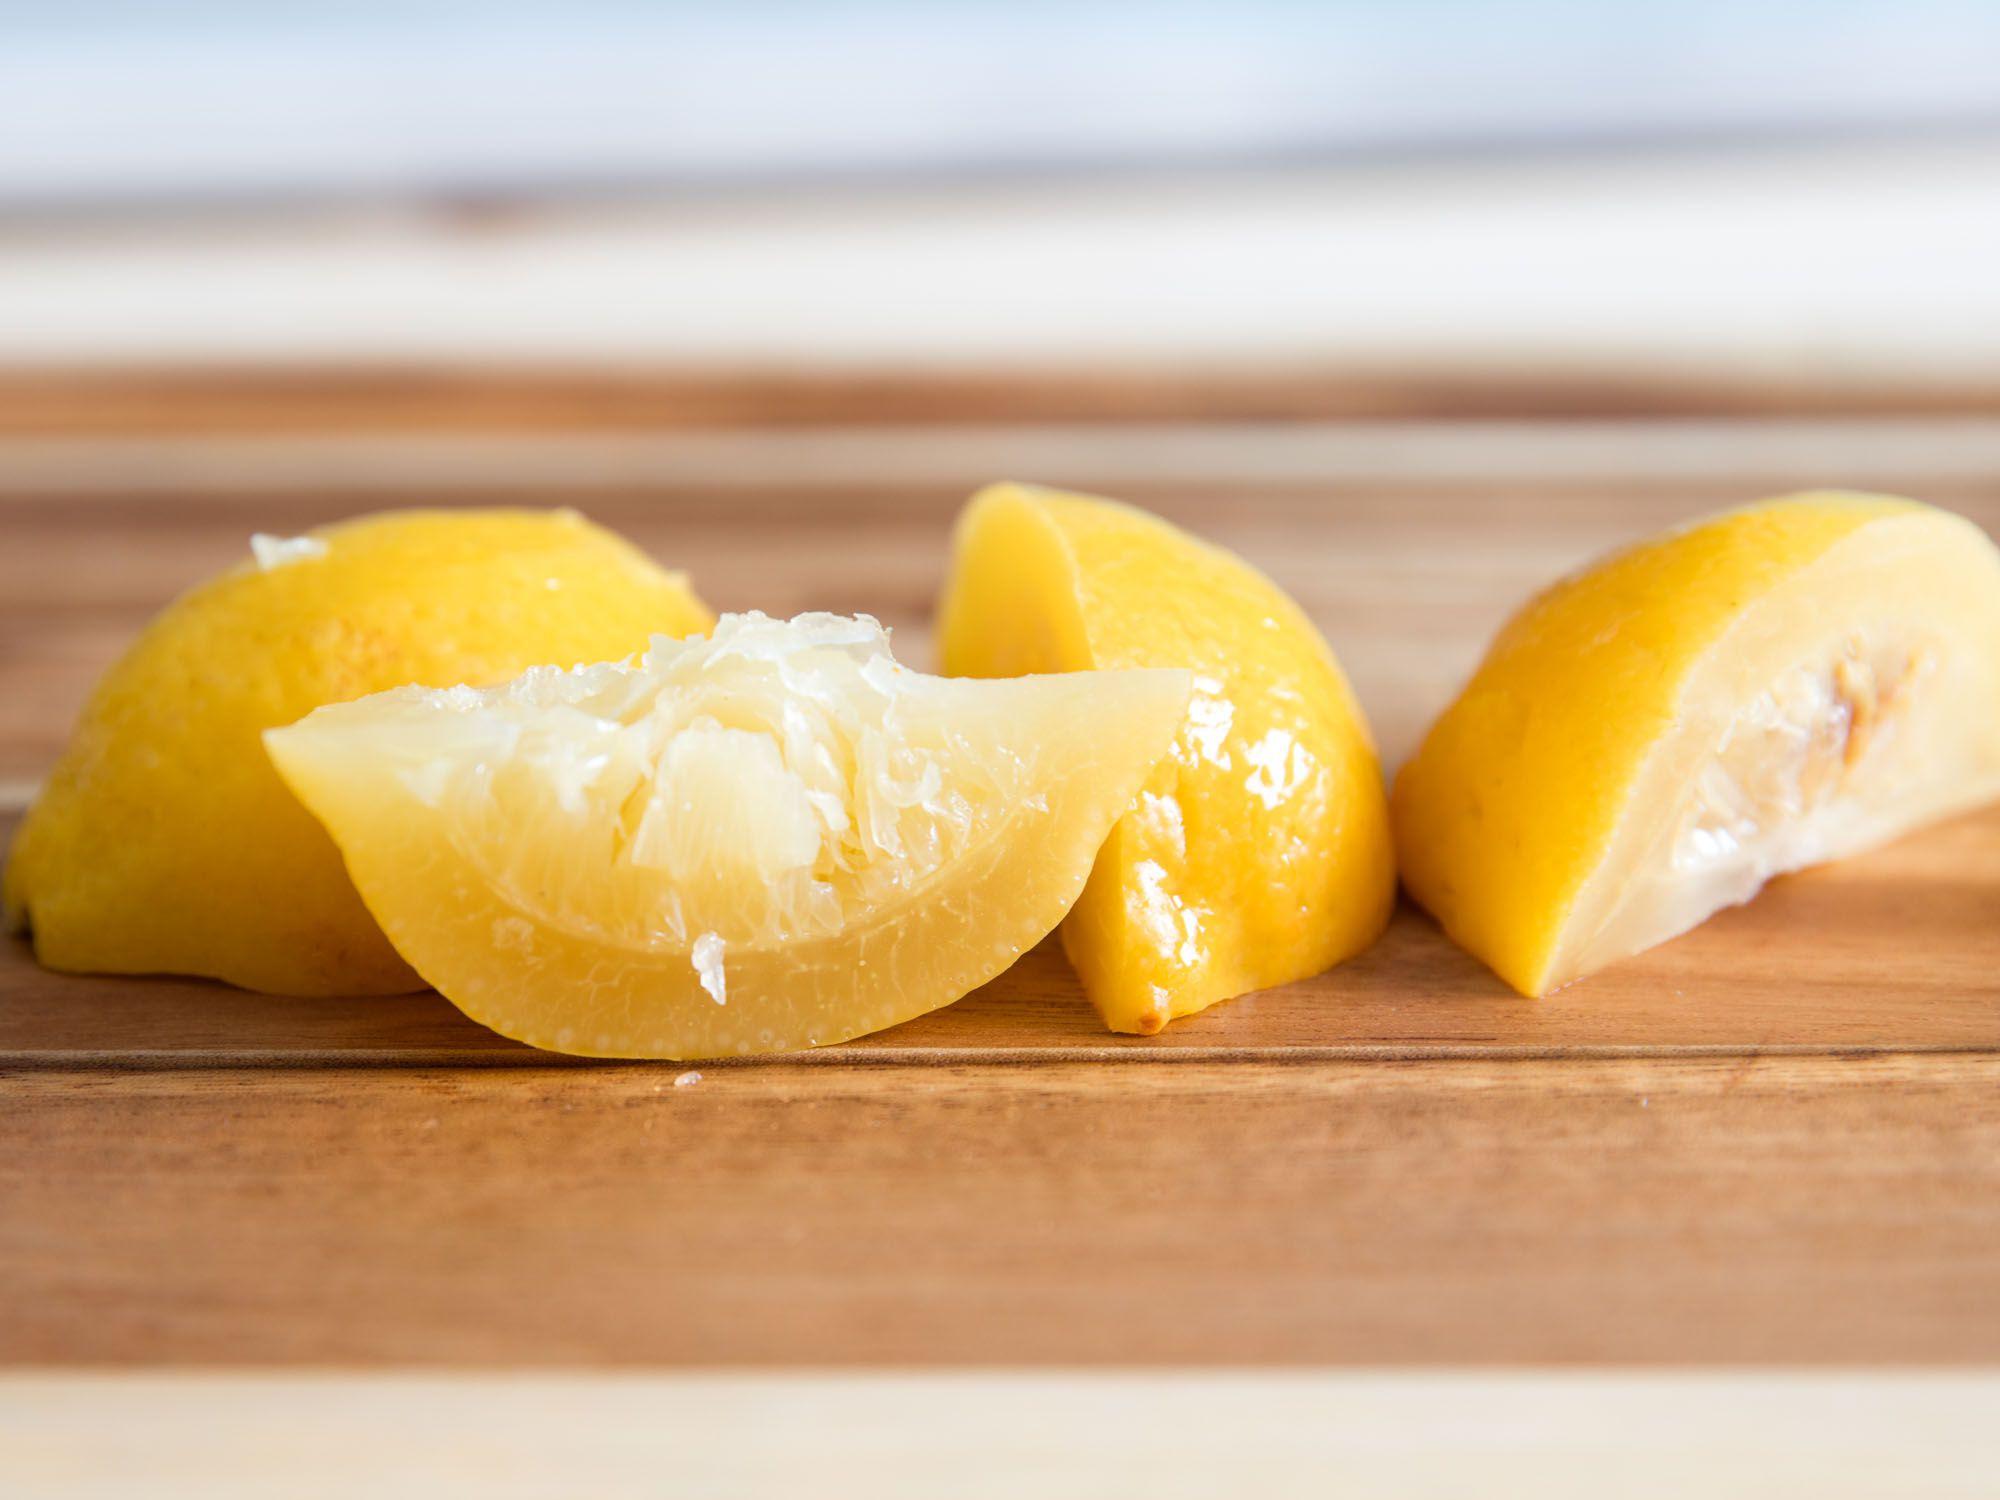 20160422-preserved-lemons-vicky-wasik-1-2.jpg